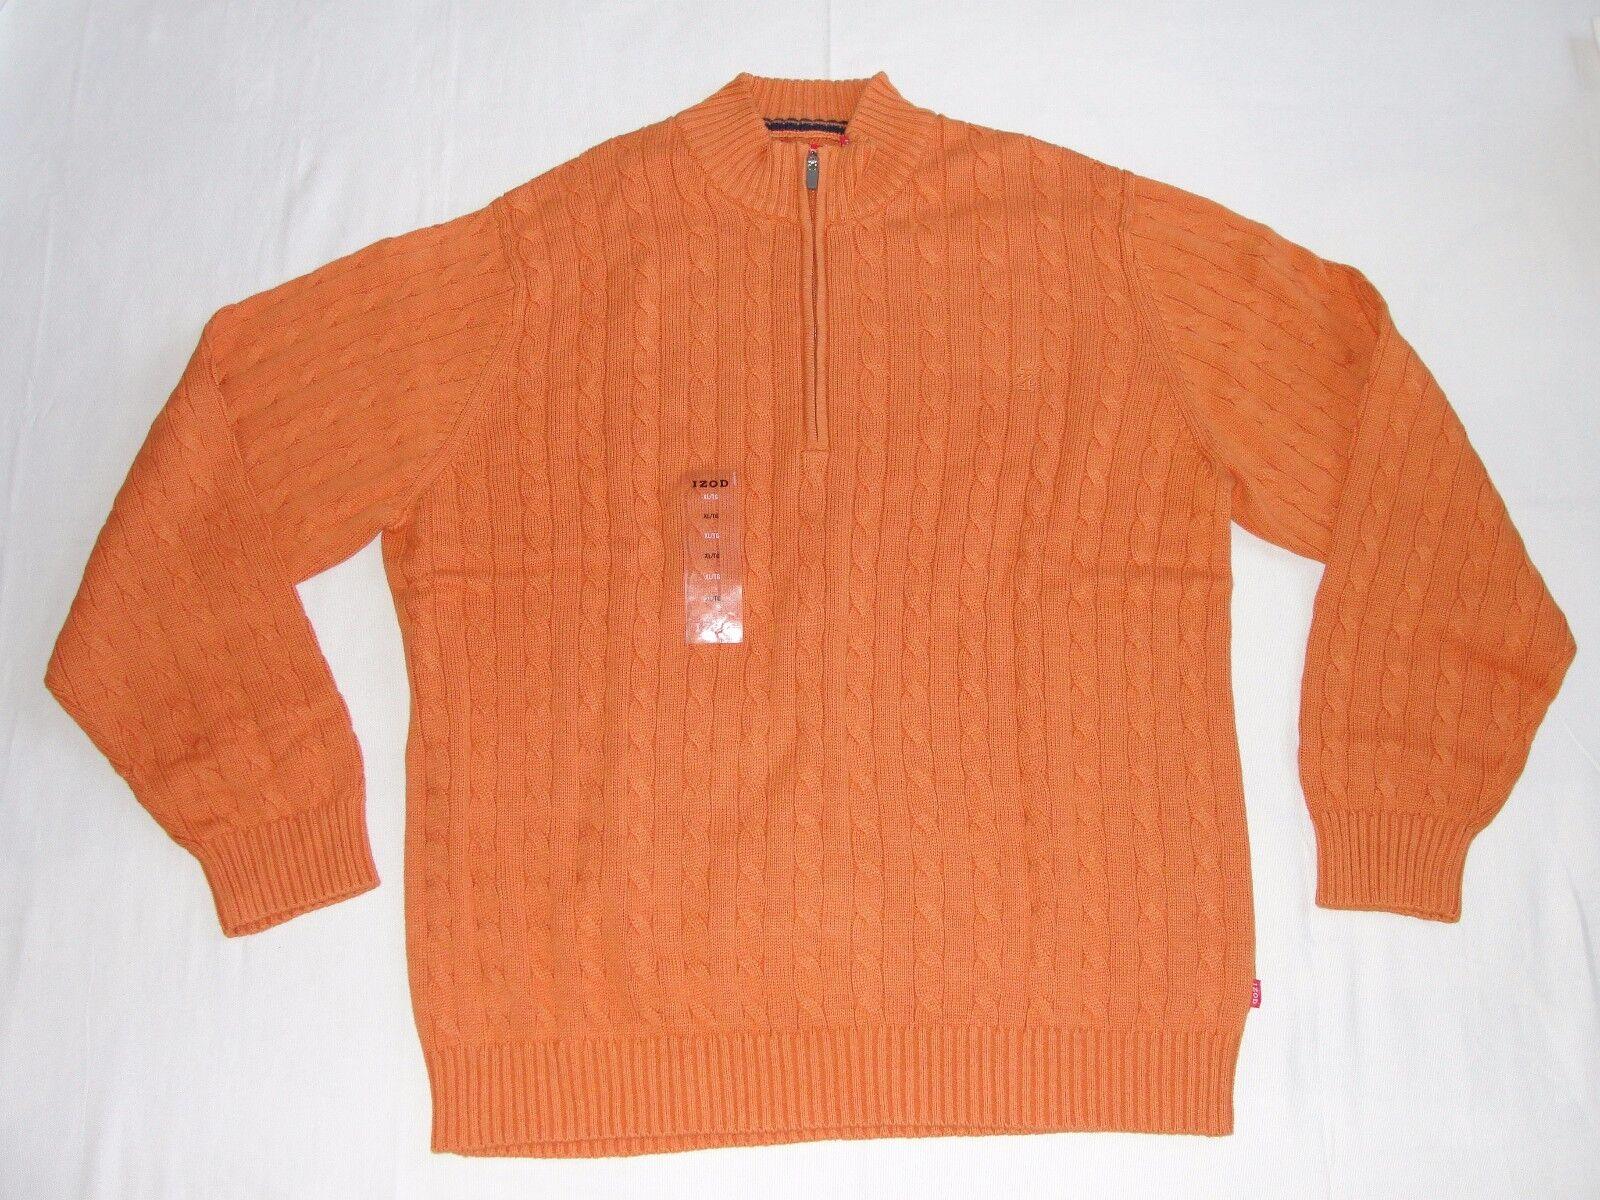 Men\'s IZOD Cable Knit Sweater 1/4 Zip Apricot Orange Size XL   eBay